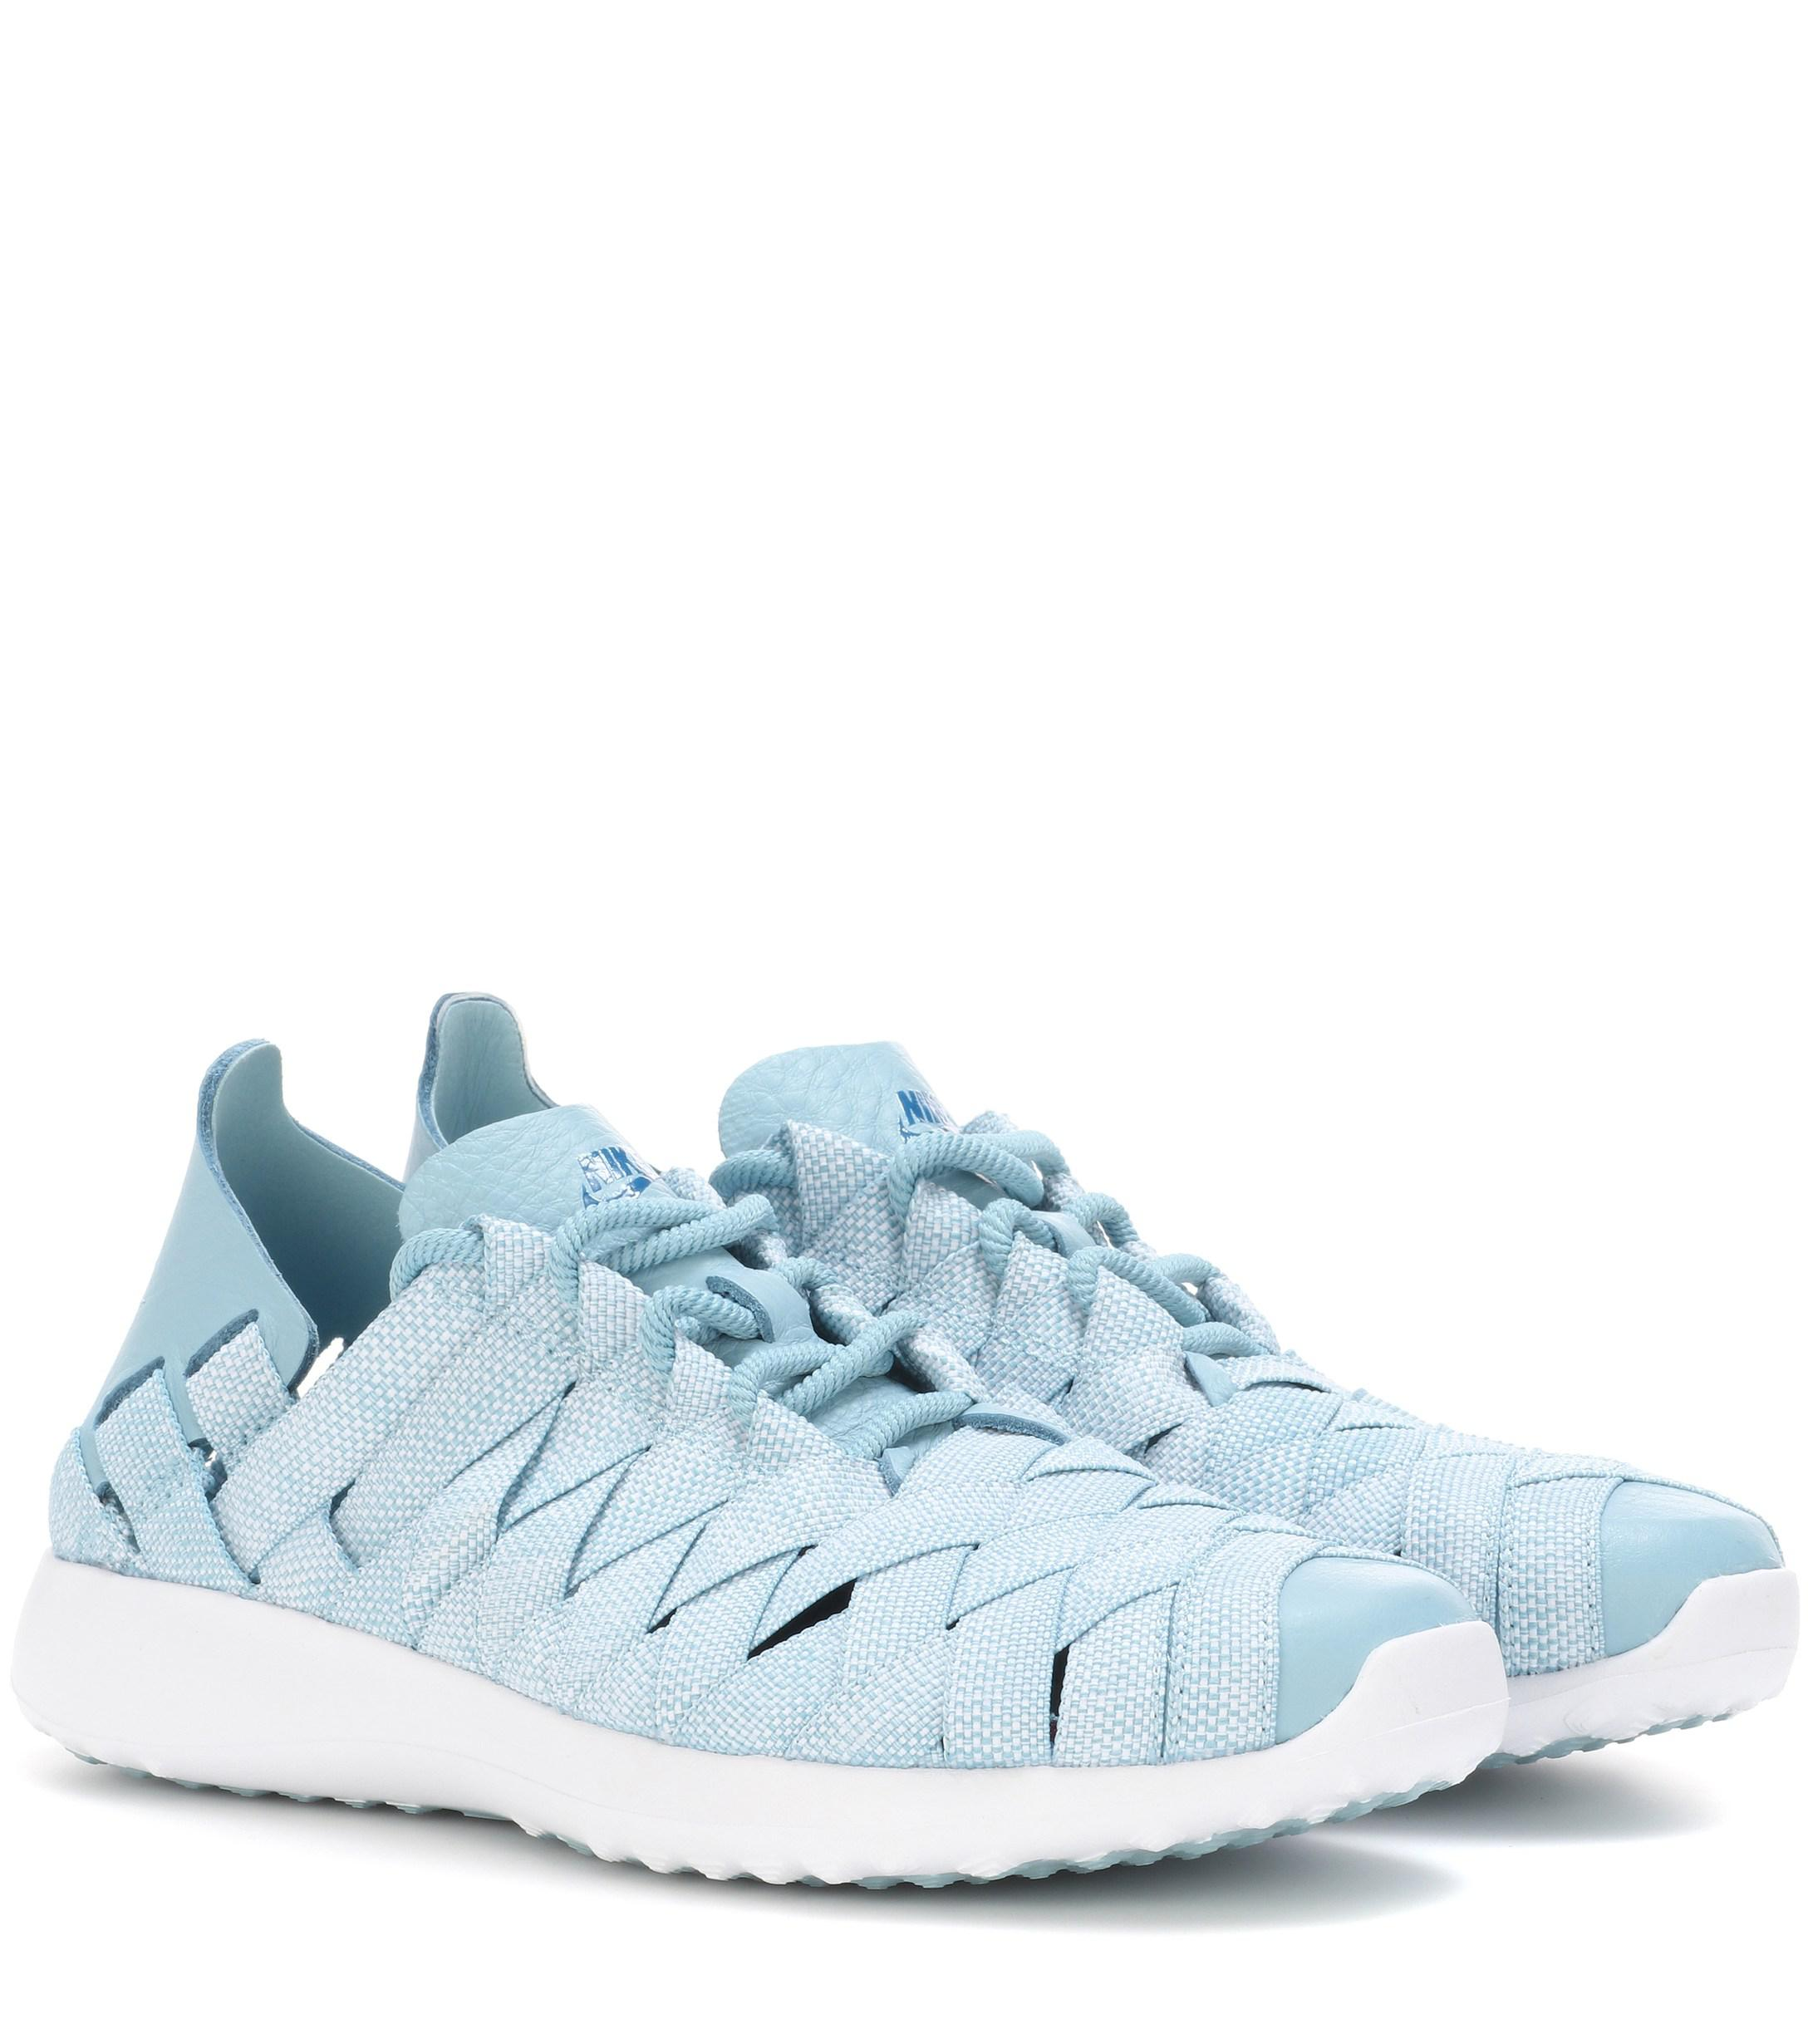 half off 0e17c 77e6b Nike. Women s Blue Juvenate Woven Sneakers